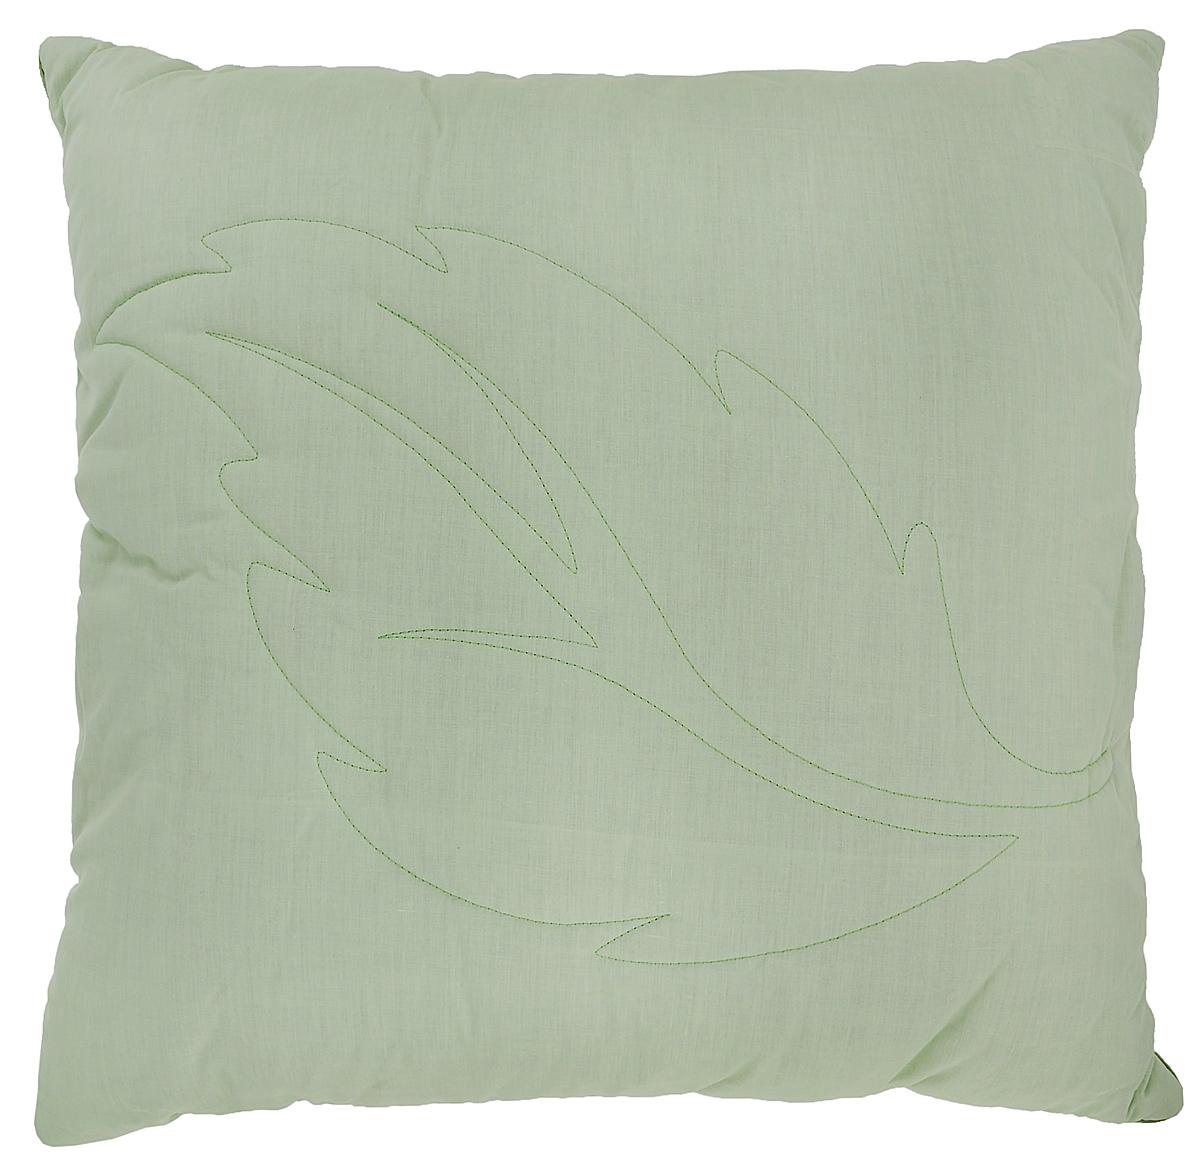 "Подушка Primavelle ""Ortica"", наполнитель: крапива, цвет: светло-зеленый, 68 х 68 см"